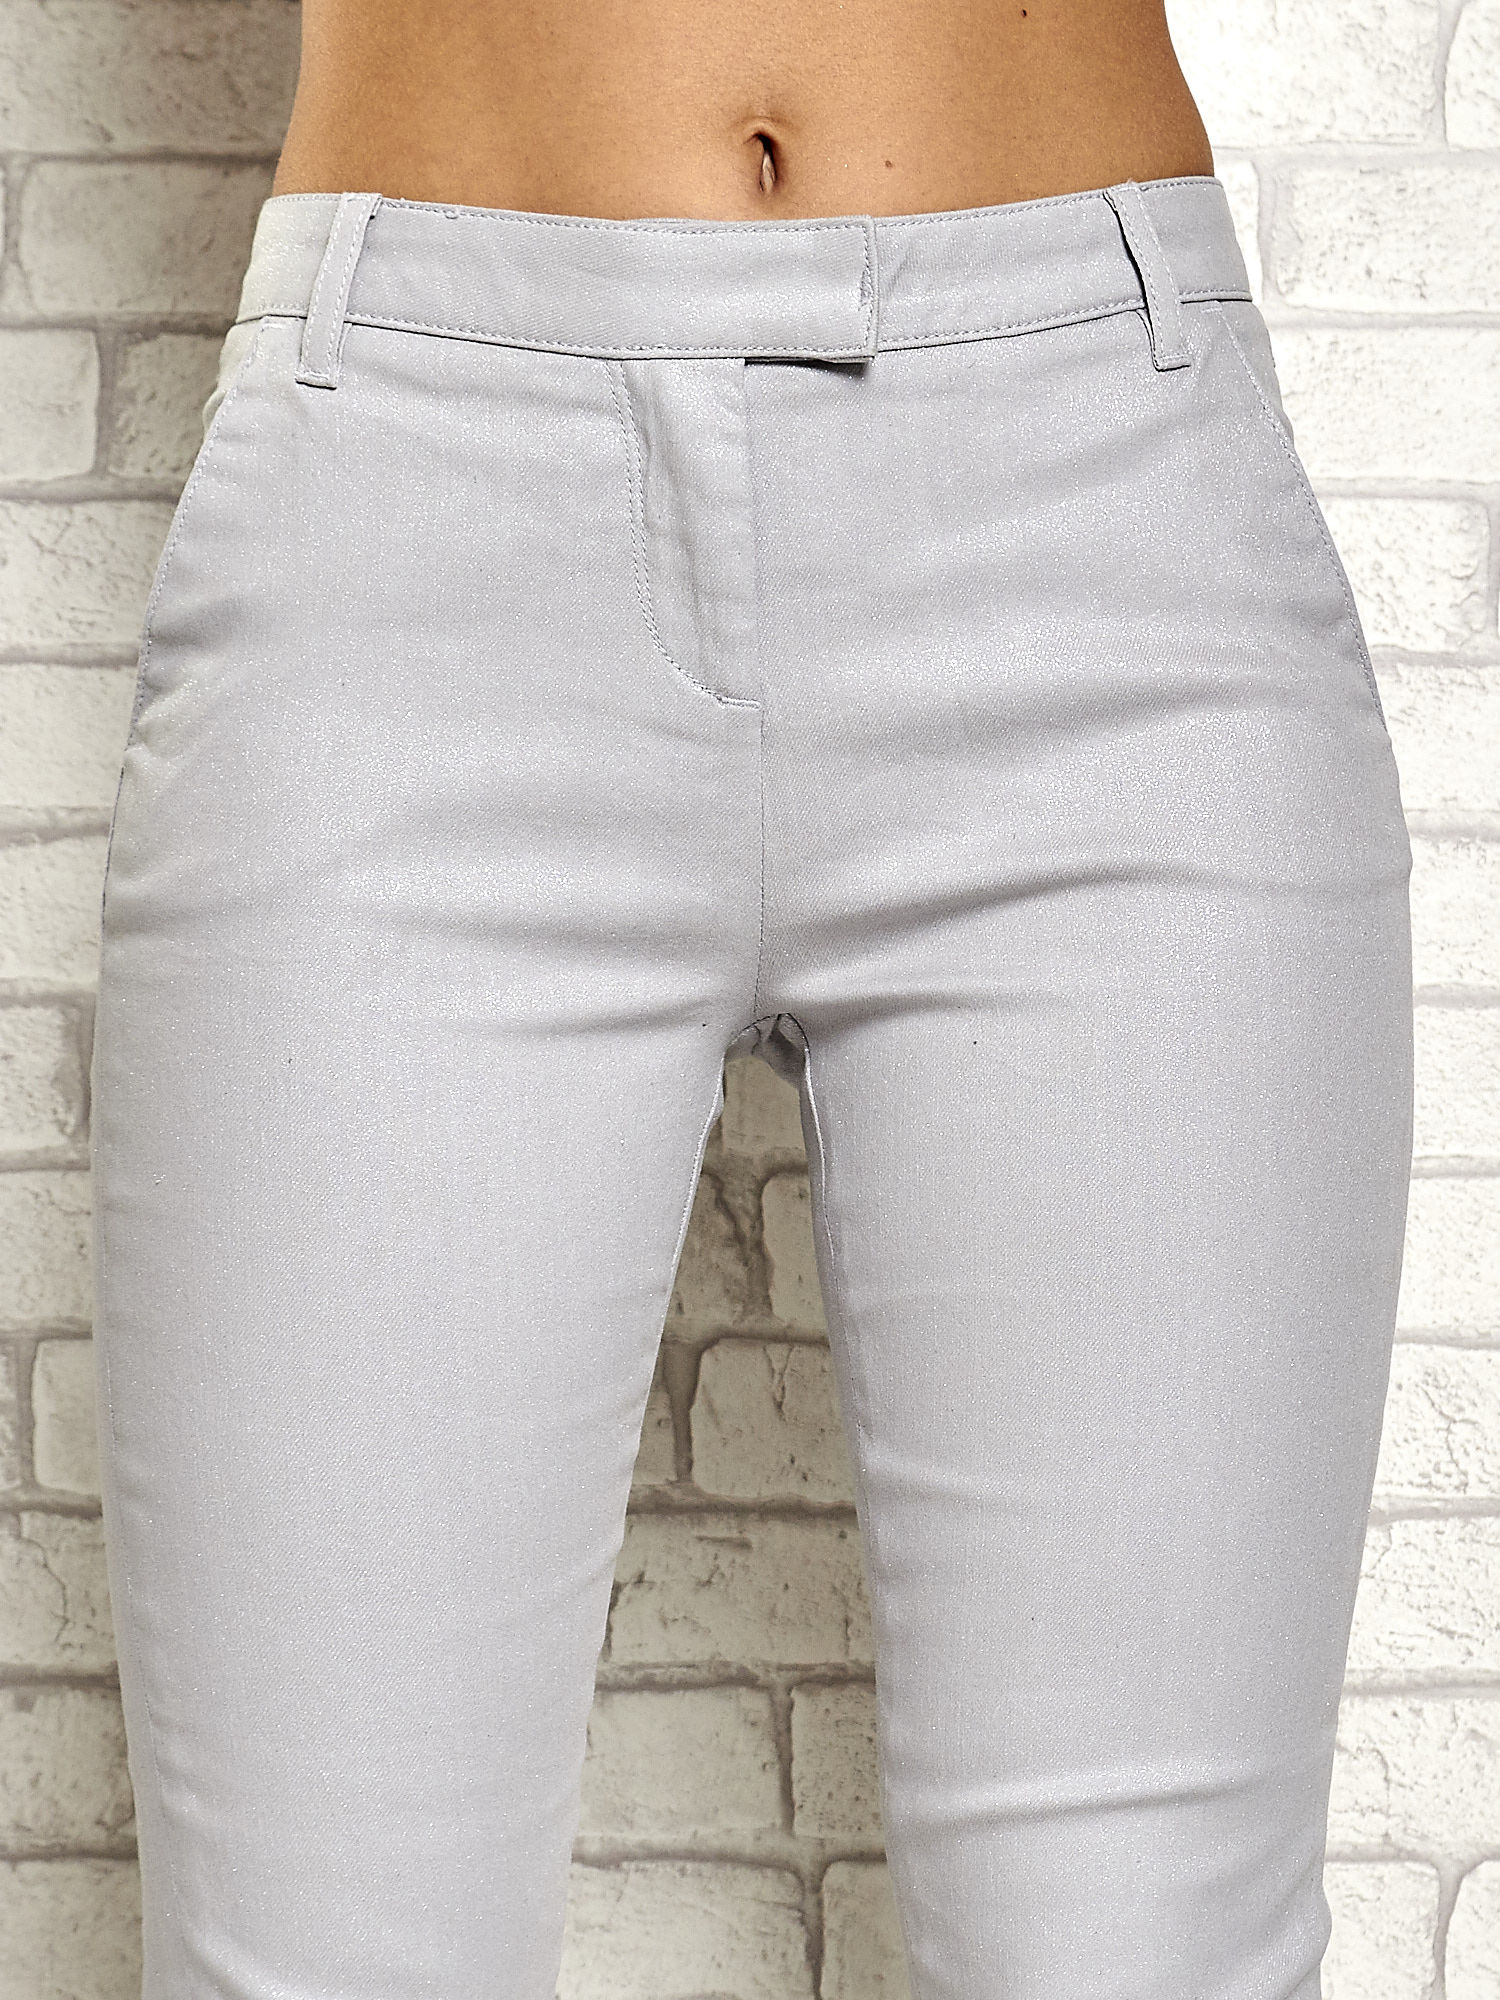 Srebrne brokatowe spodnie                                  zdj.                                  4